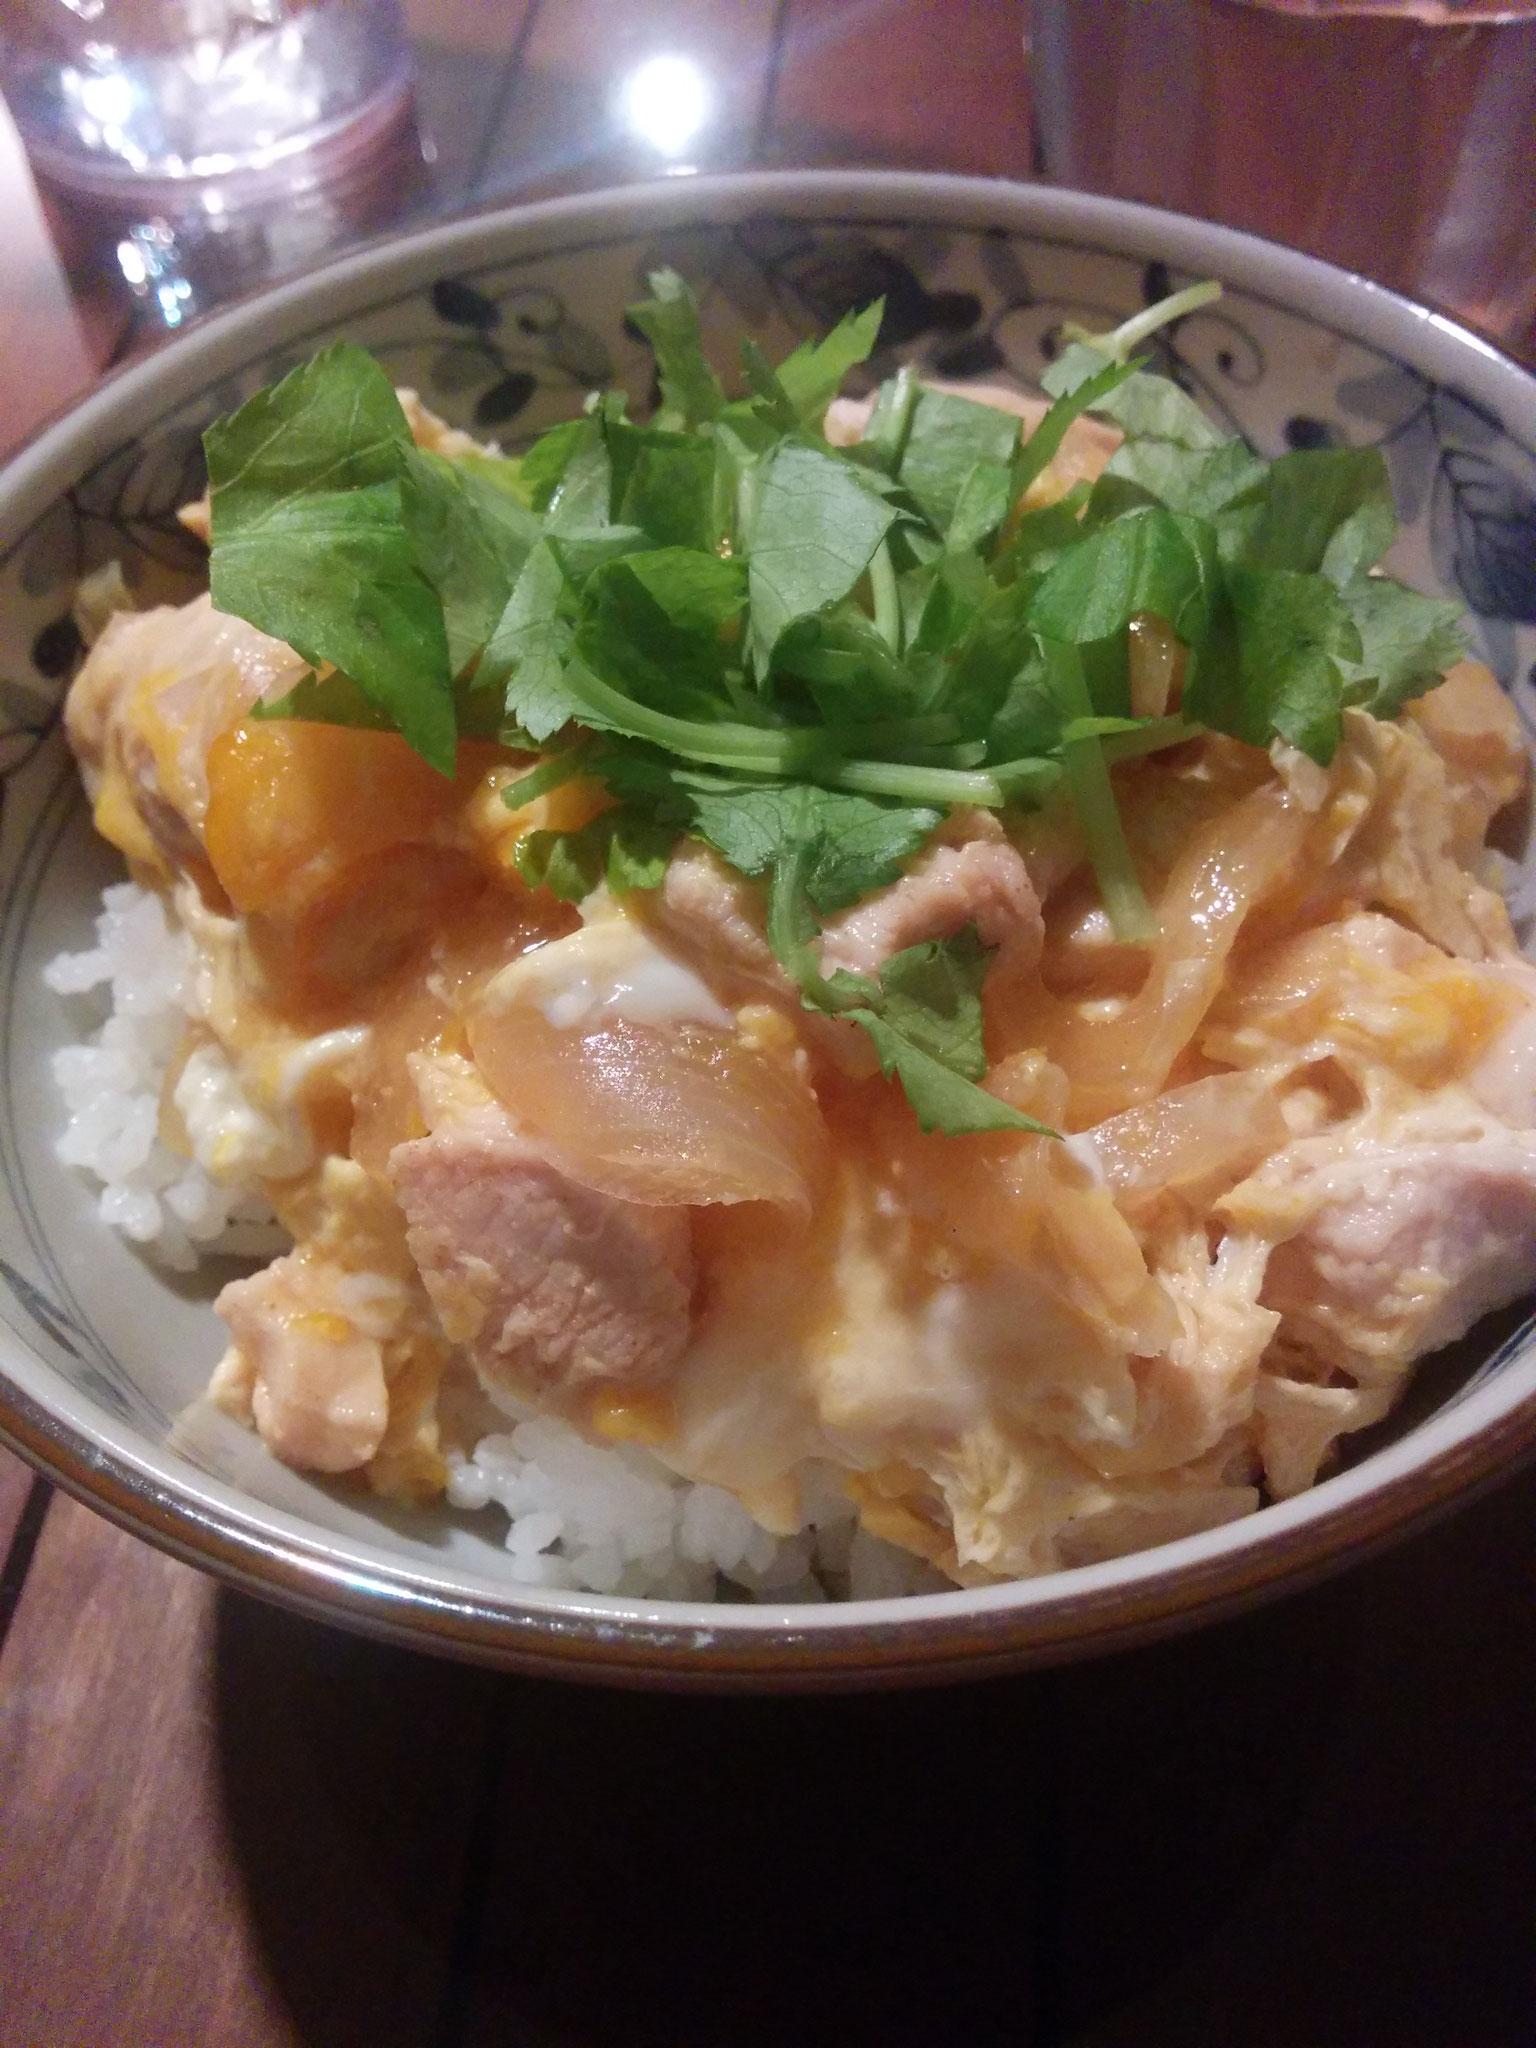 6 Oyakodon - my favorite meal so far